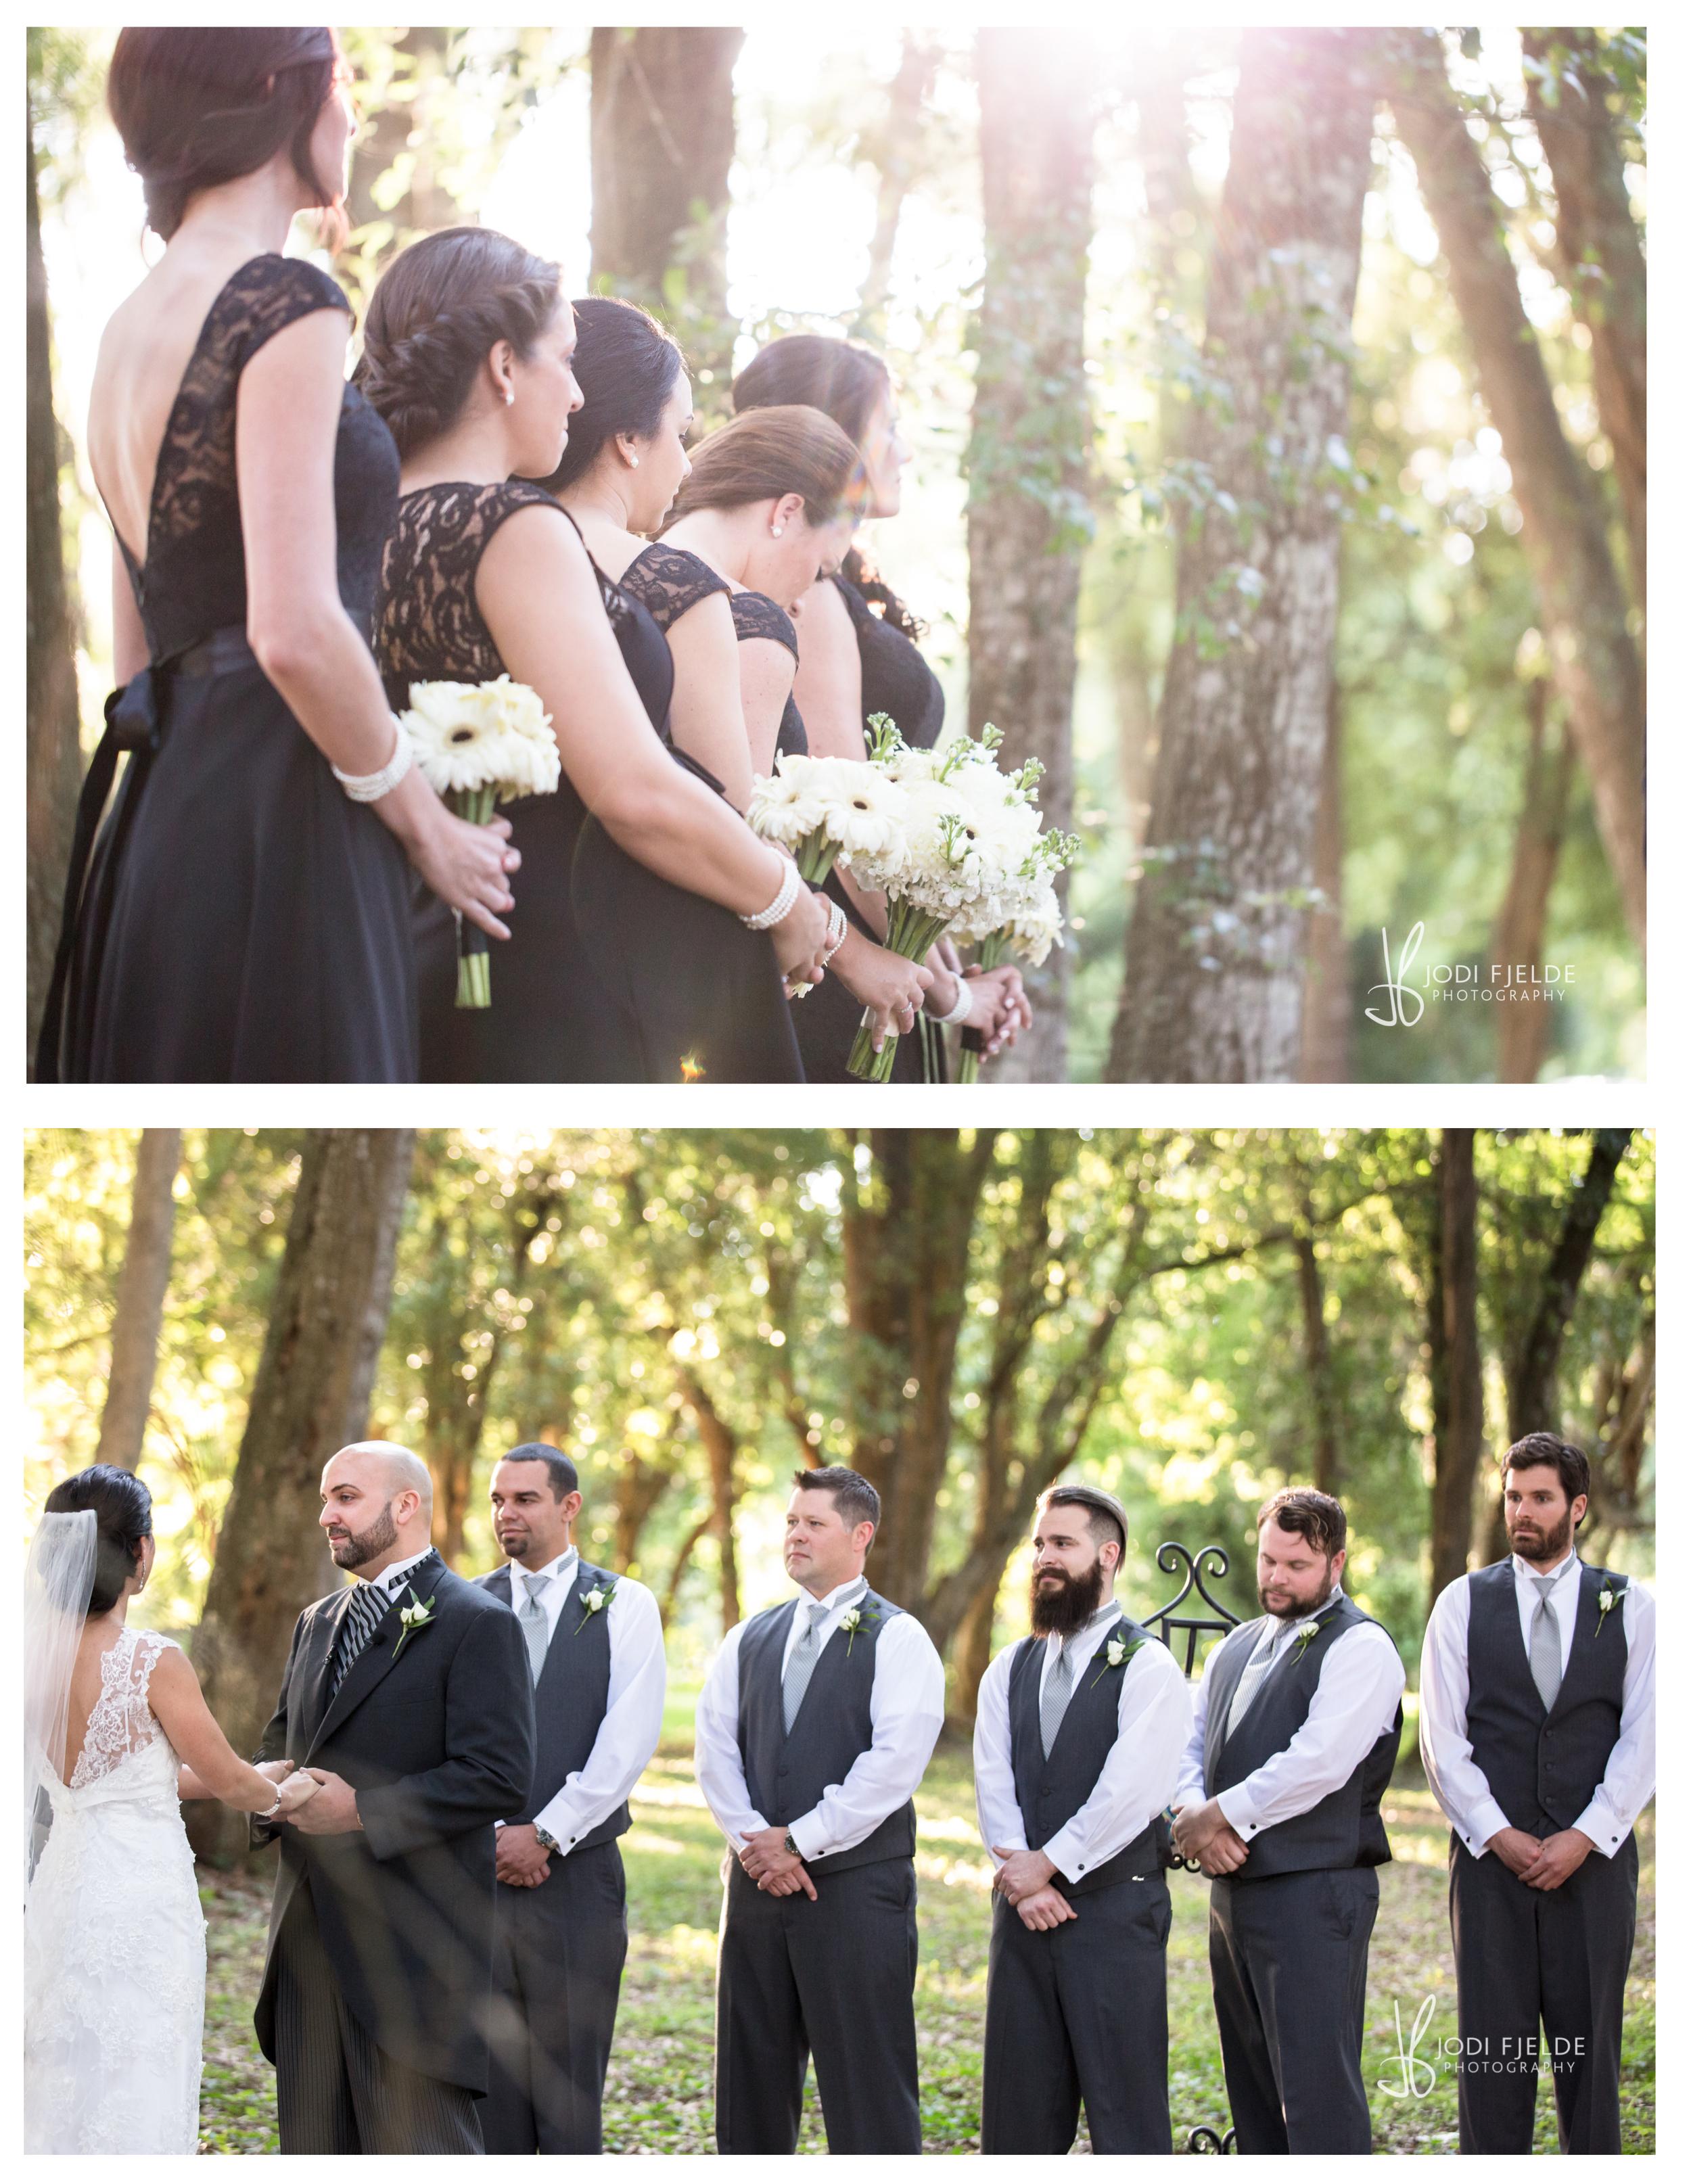 Highland_Manor_Apopka_Florida_wedding_Jackie_&_Tim_photography_jodi_Fjelde_photography-15.jpg